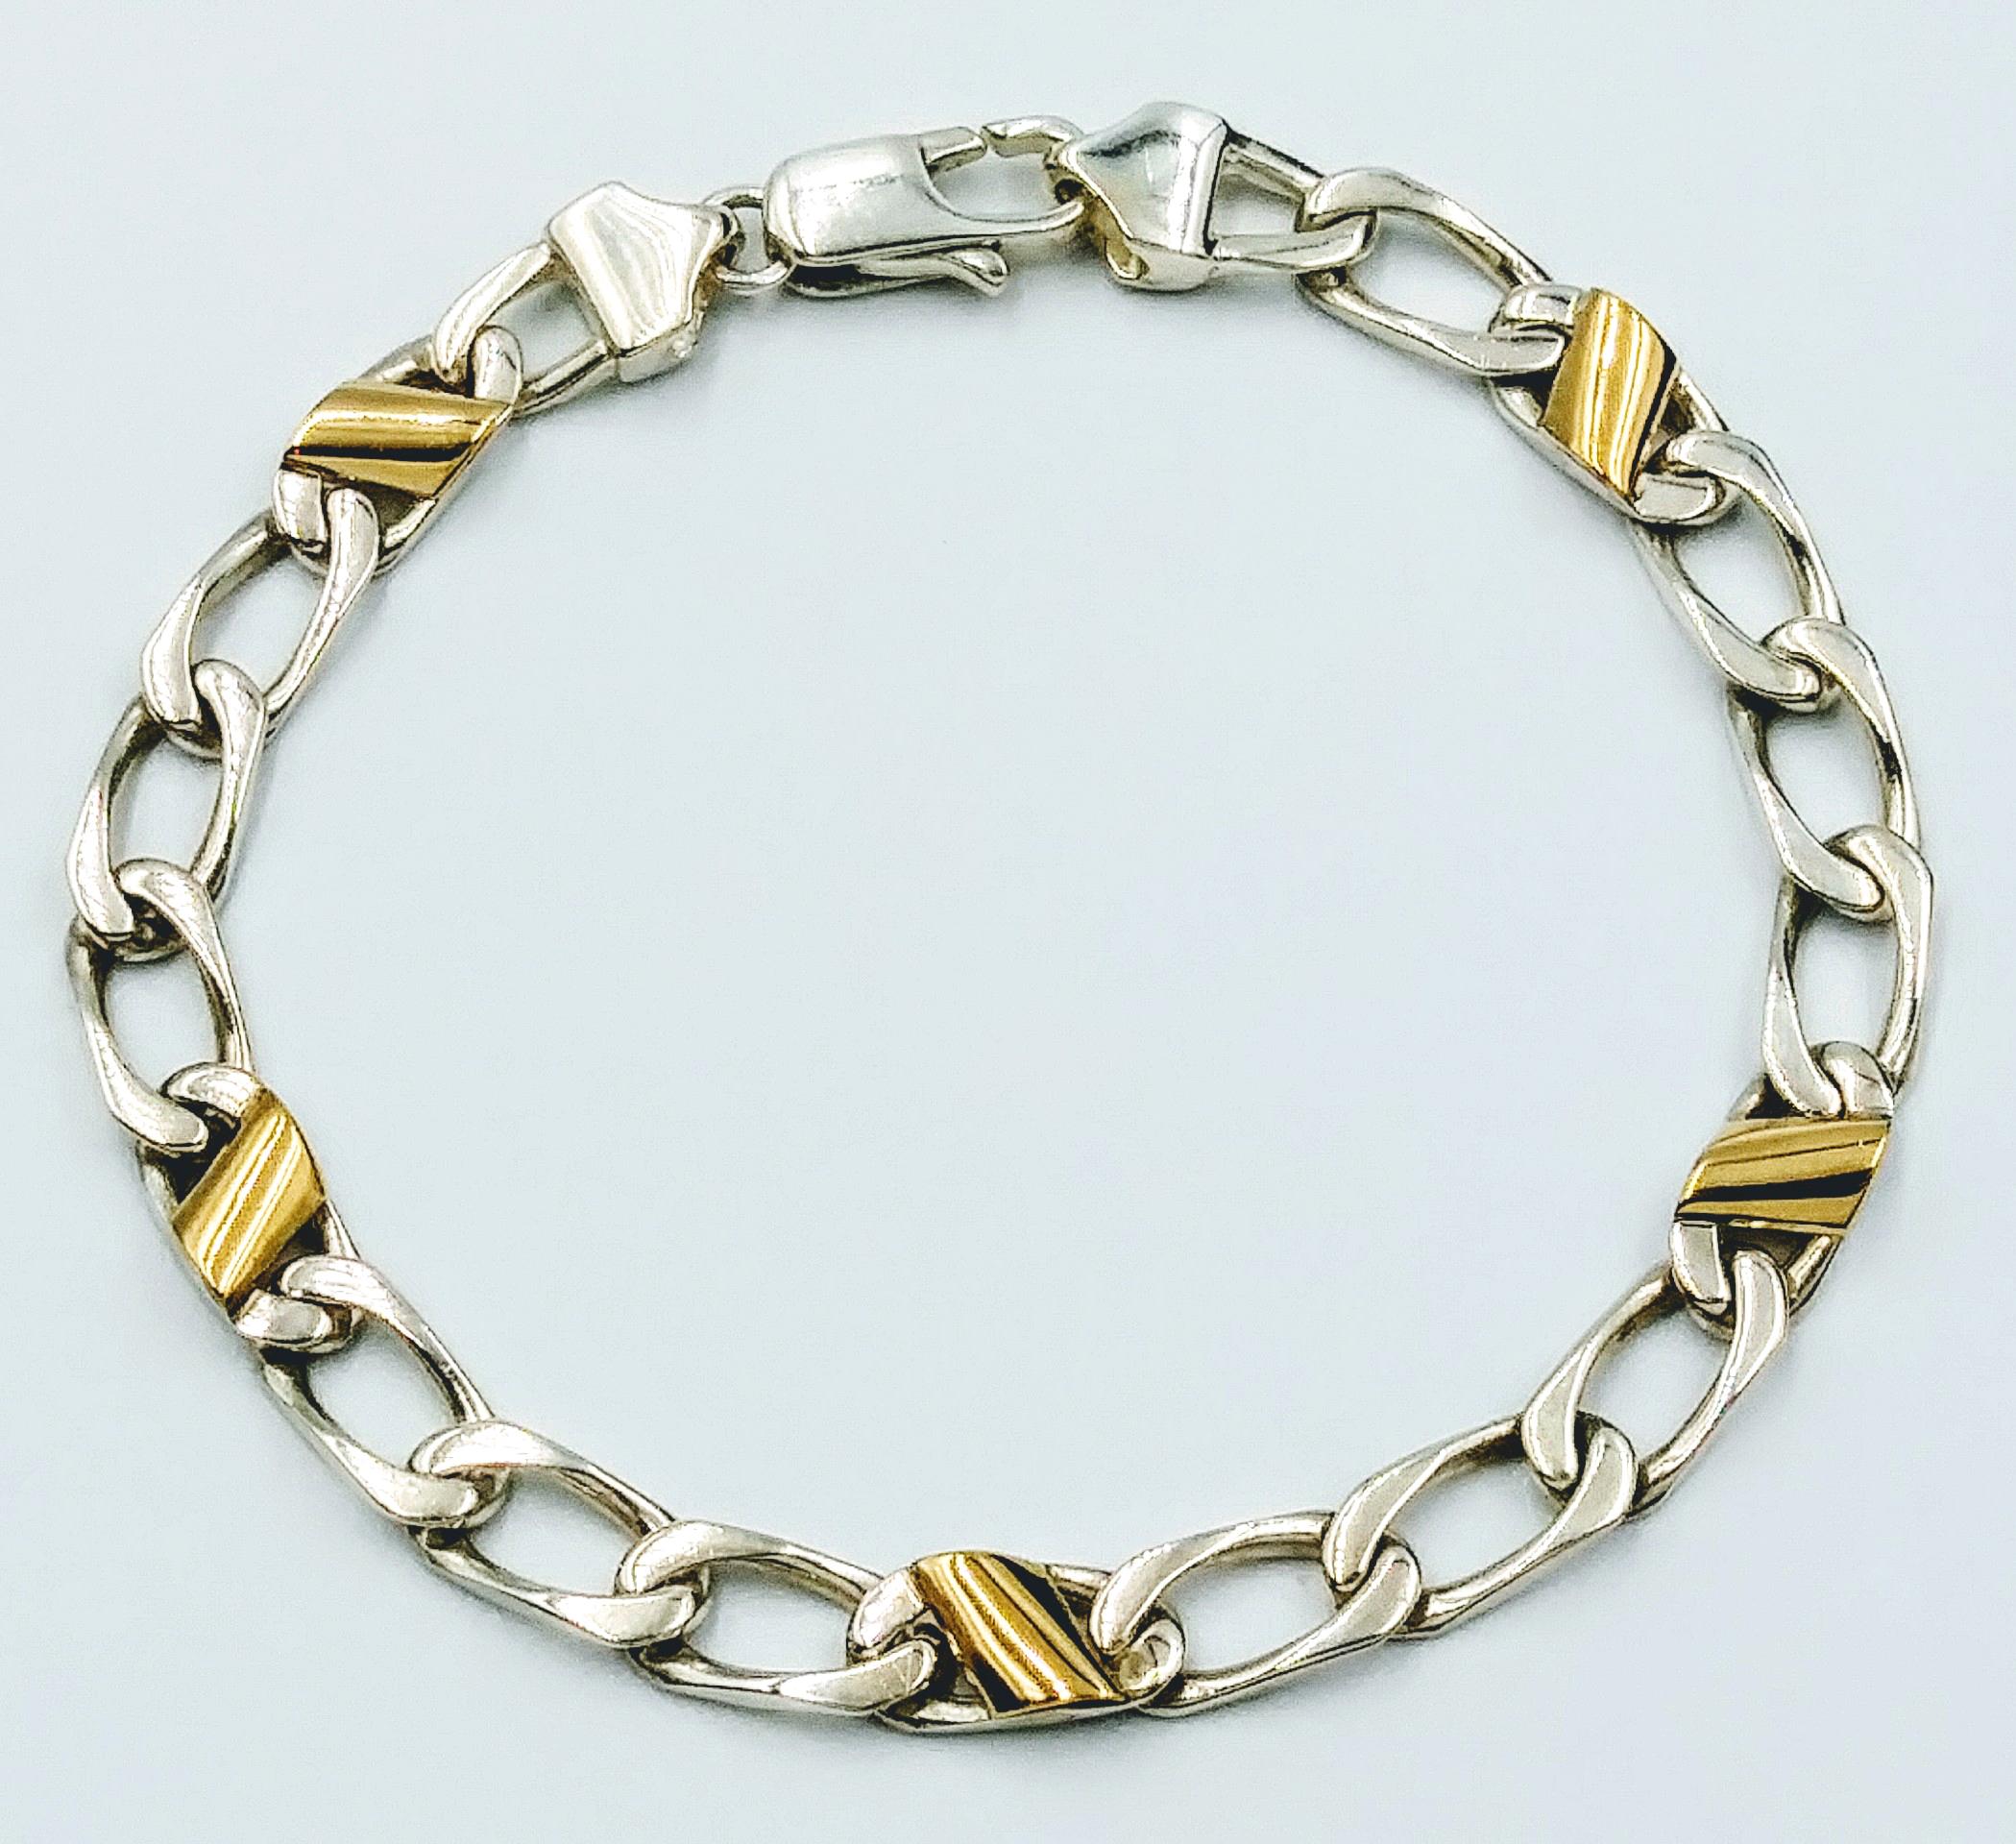 <b>Tiffany & Co.</b> Cuban Link 18k Gold & Sterling Silver Italy Bracelet 7.5